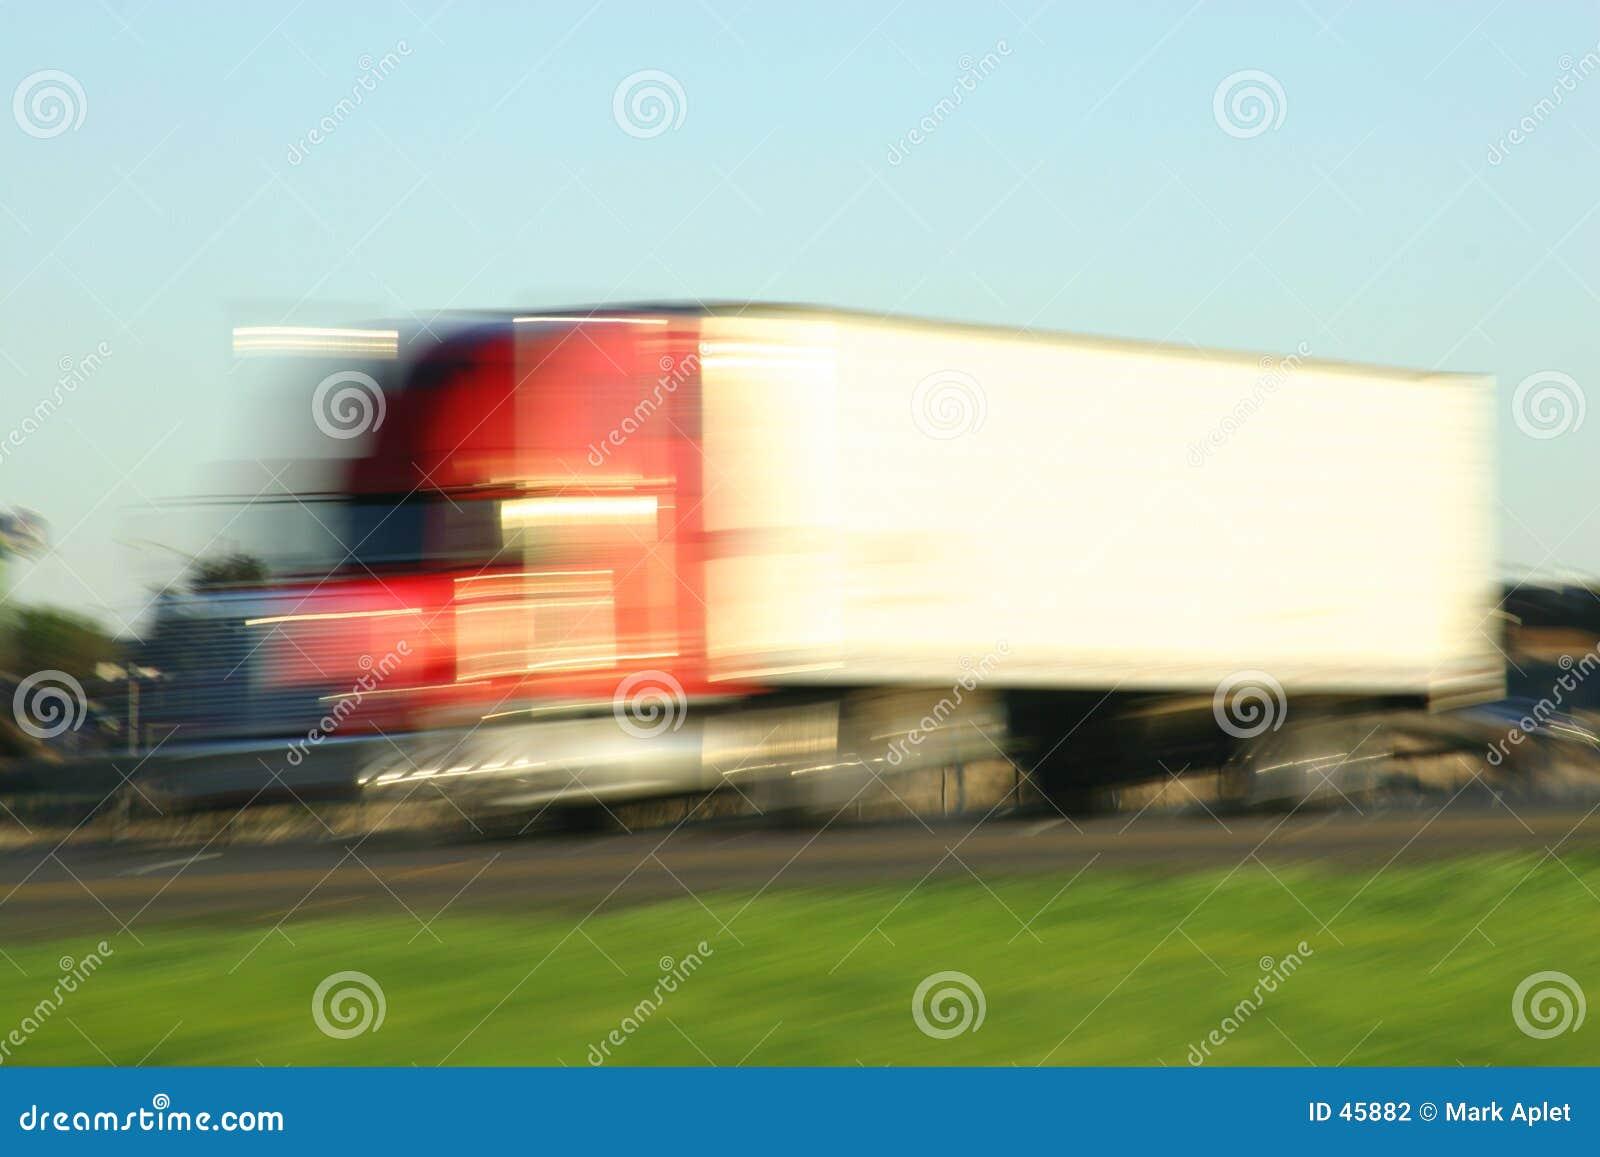 Trasporto su autocarro